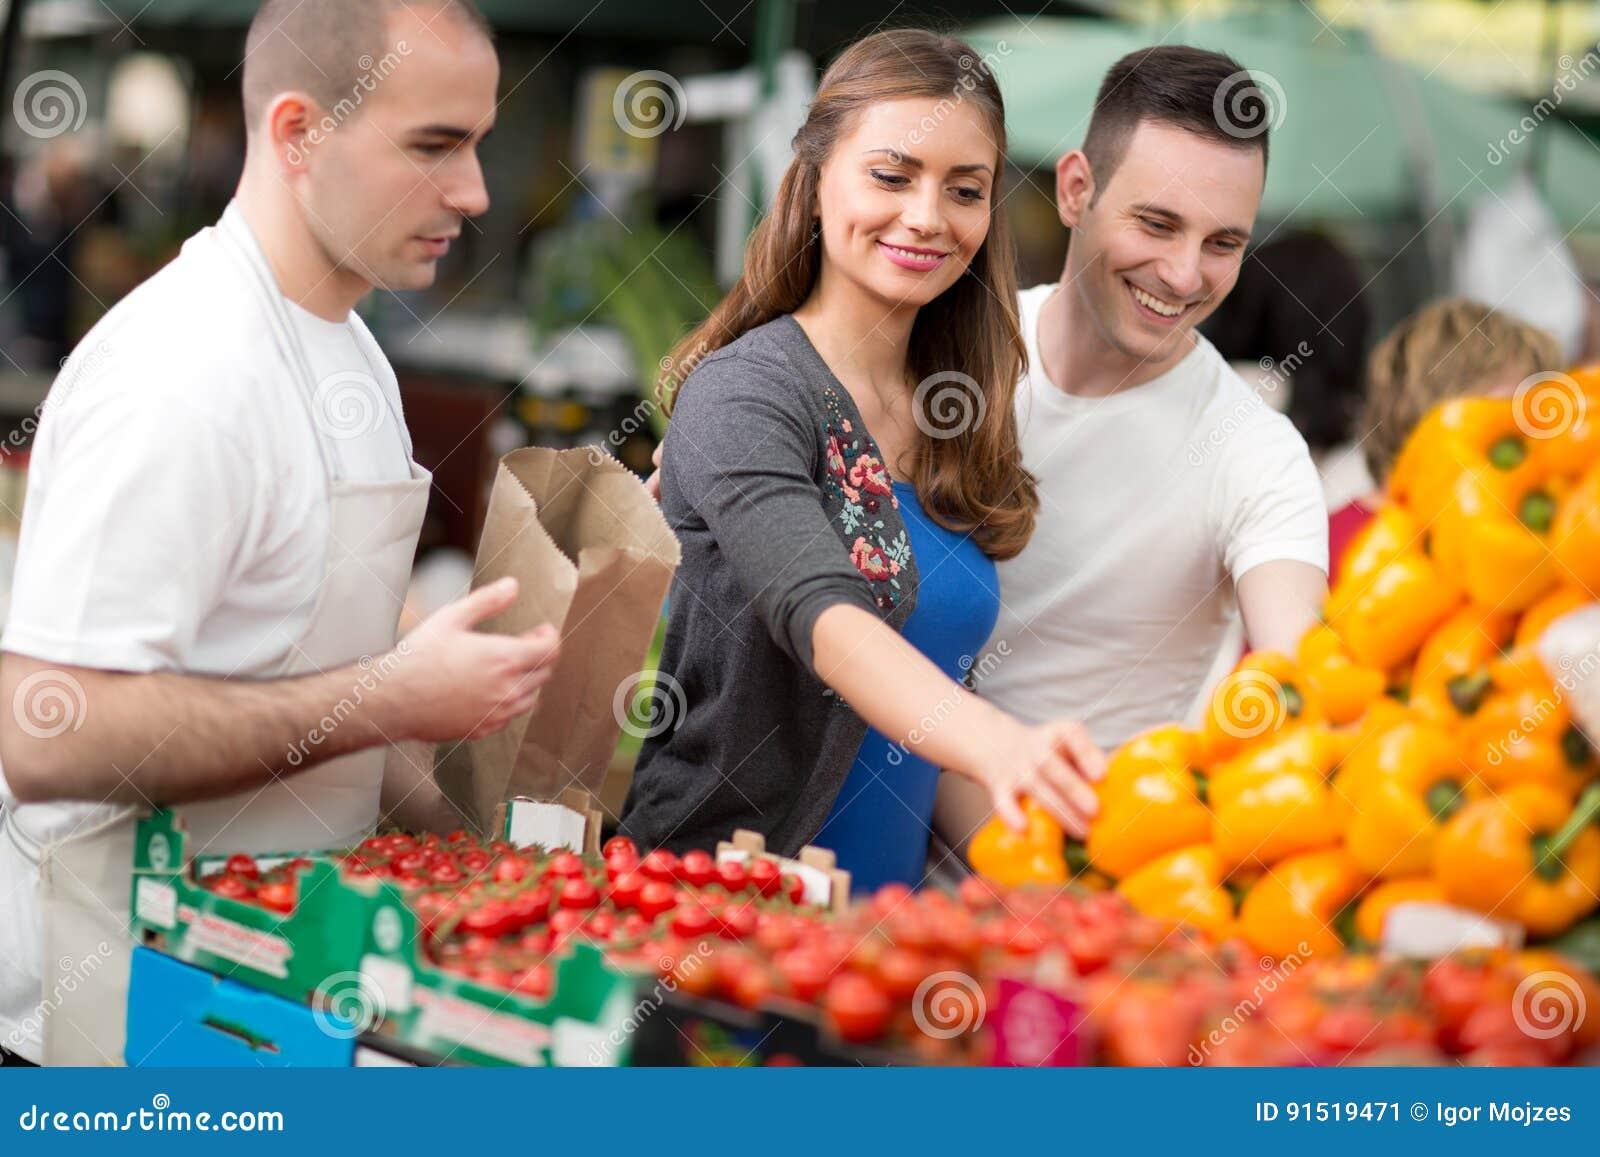 Couple choosing pepper from salesman at street market